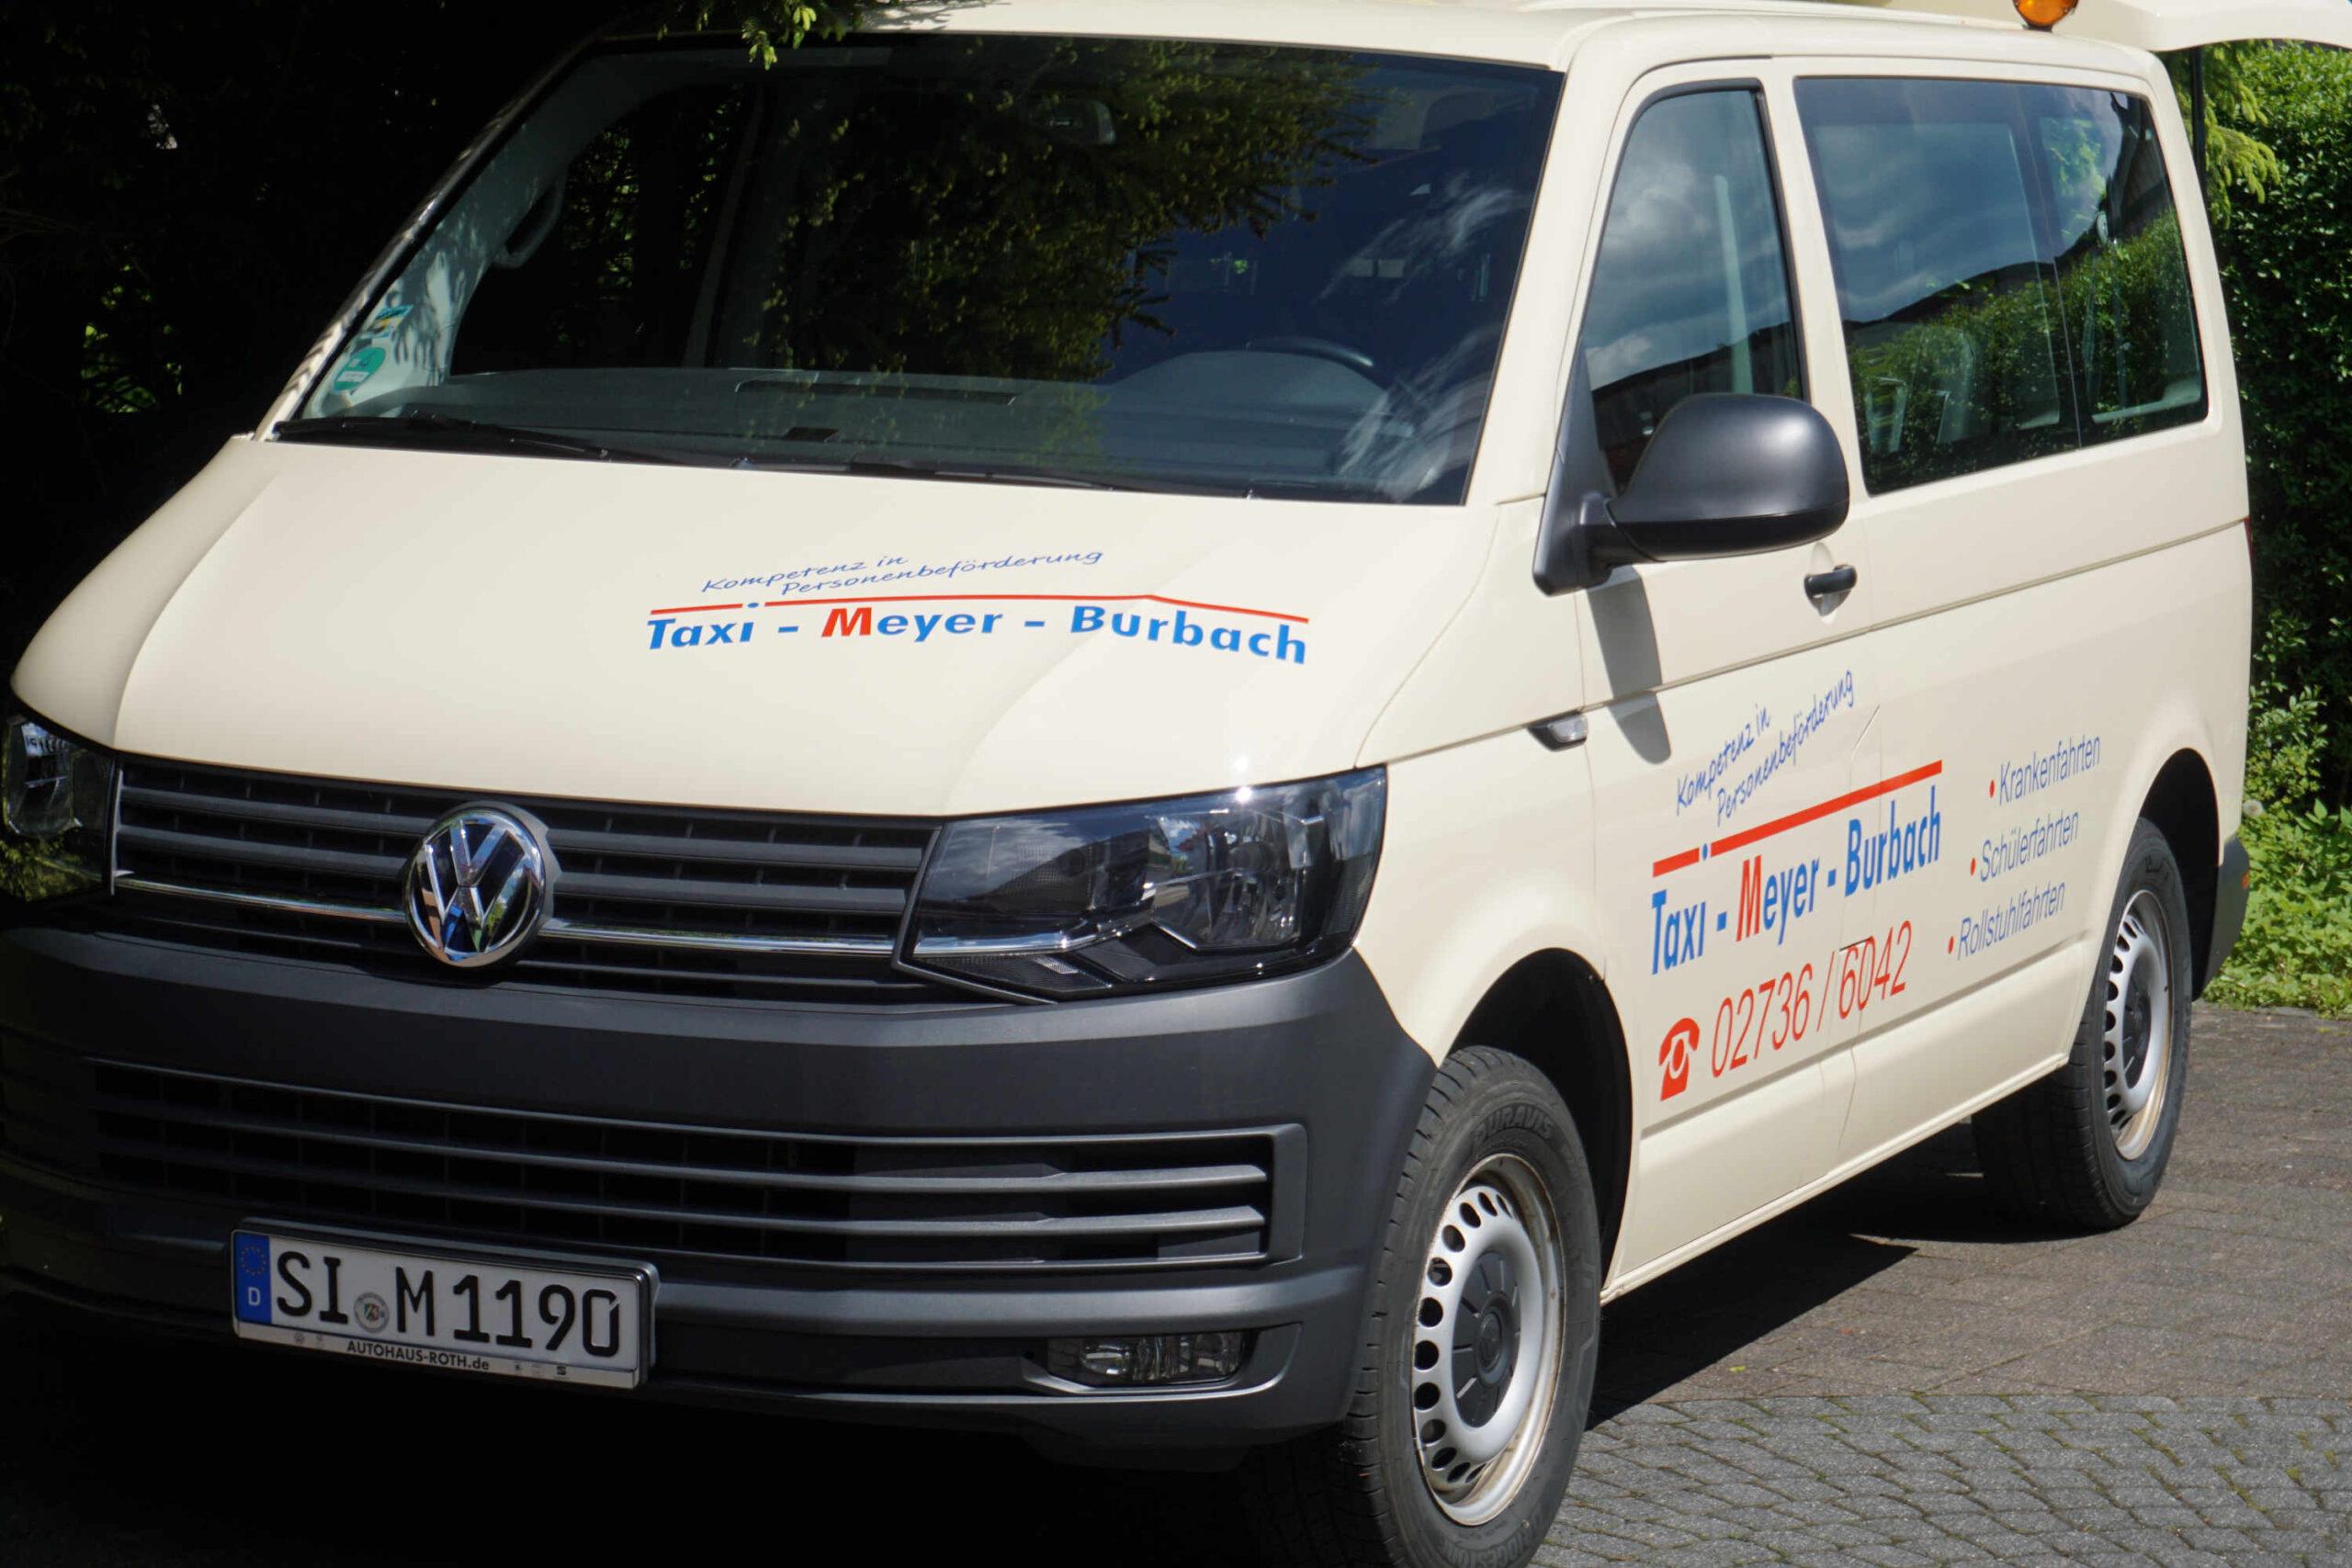 Taxibus-Grossraumtaxi-Meyer-Burbach